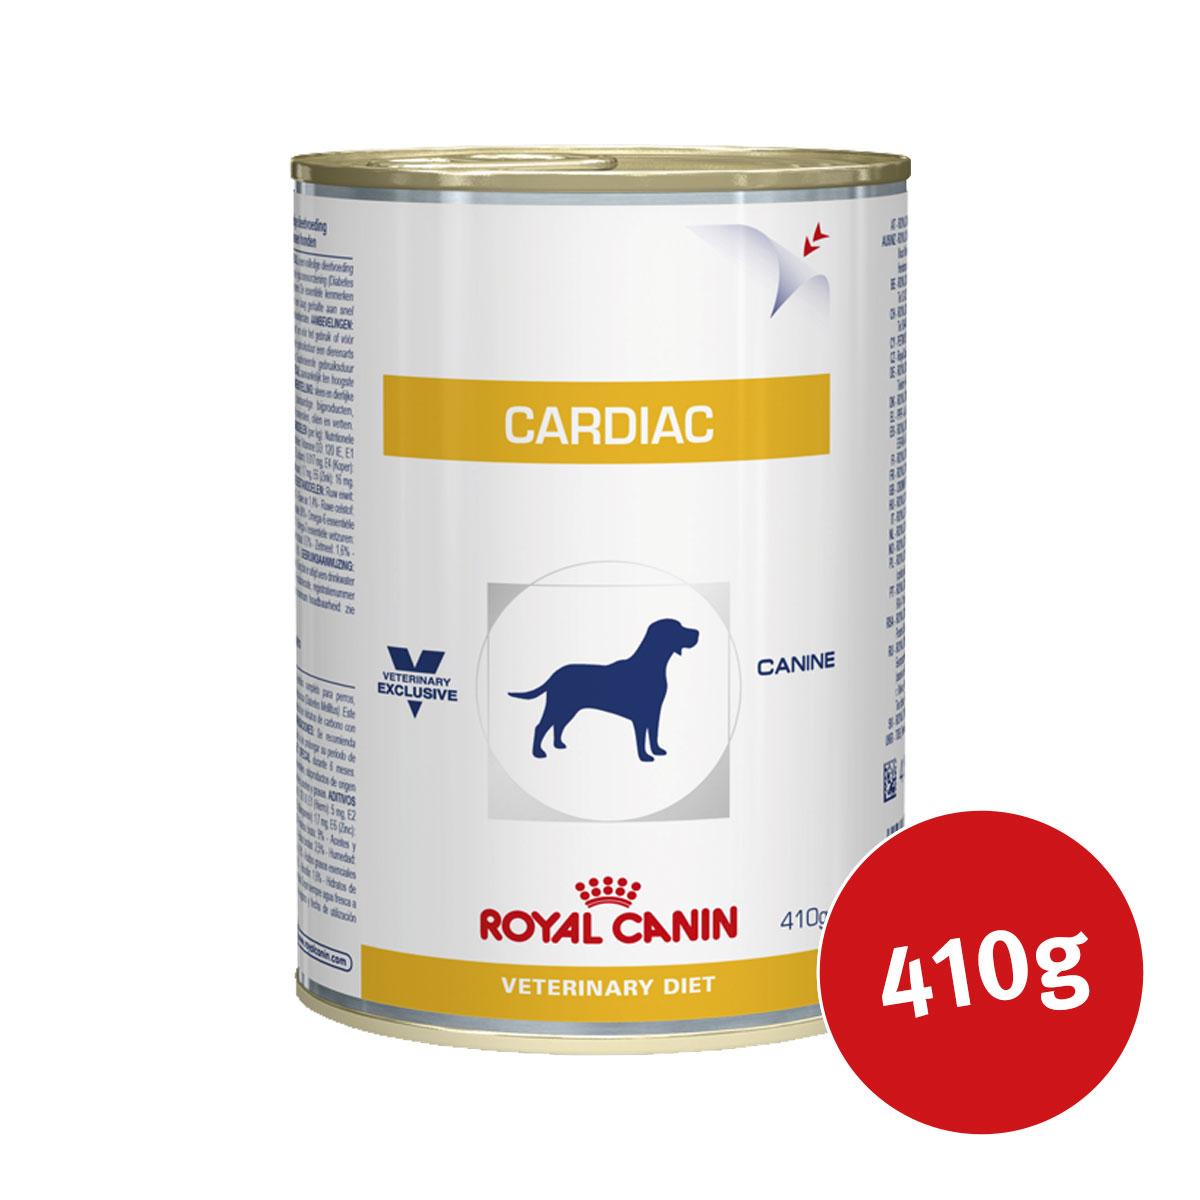 royal canin vet diet nassfutter cardiac wet kaufen bei zooroyal. Black Bedroom Furniture Sets. Home Design Ideas